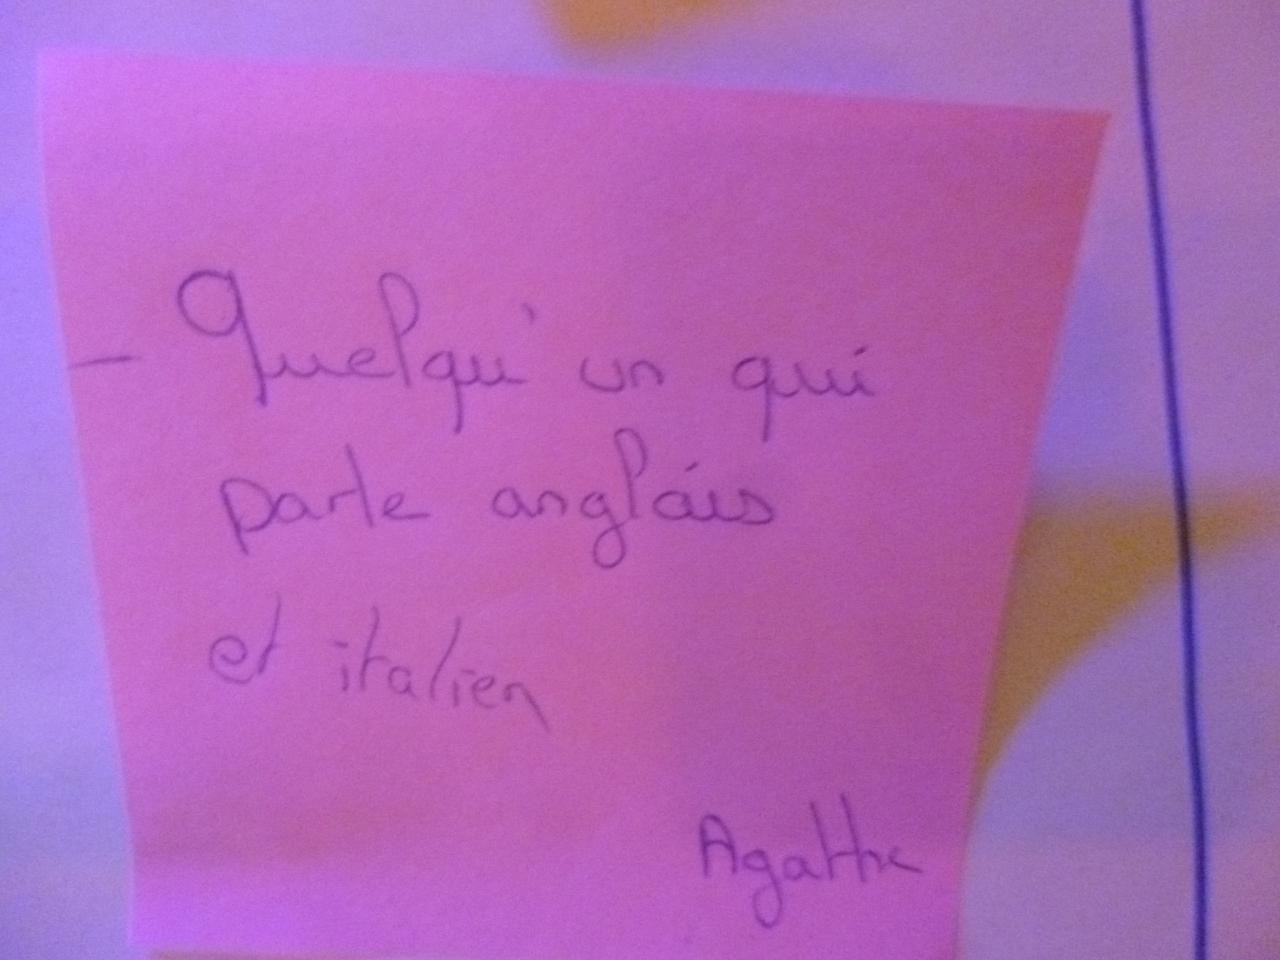 On recherche un polyglotte